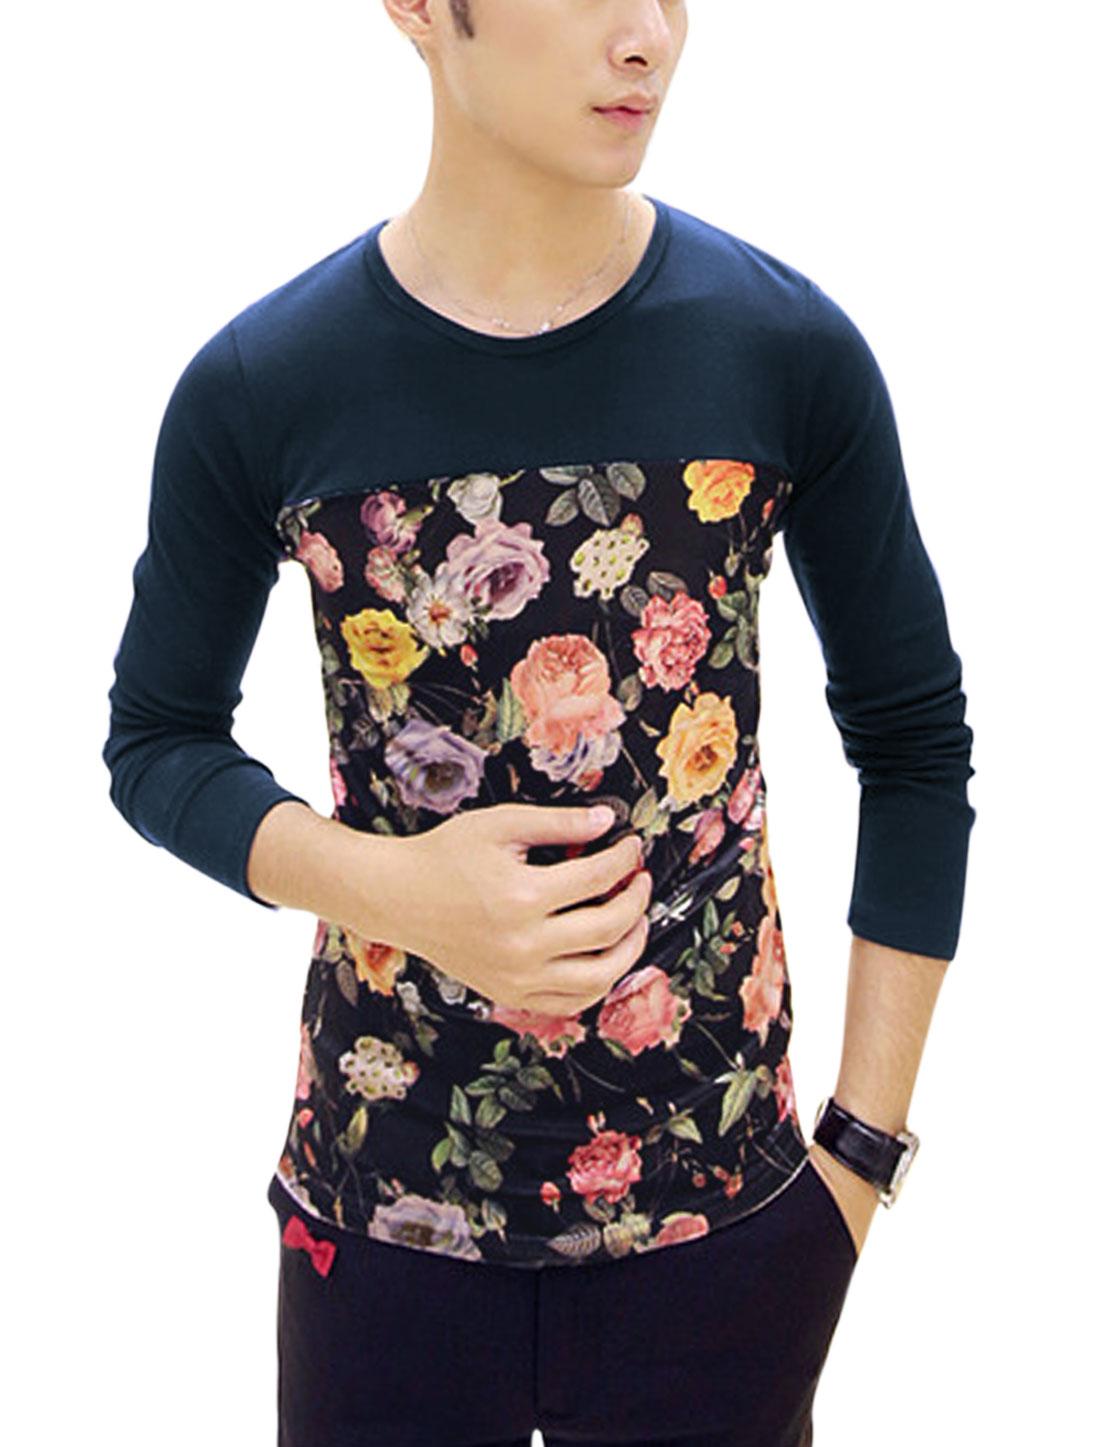 Spliced Design Floral Print Contrast Long Sleeves Soft Shirt for Men Navy Blue S